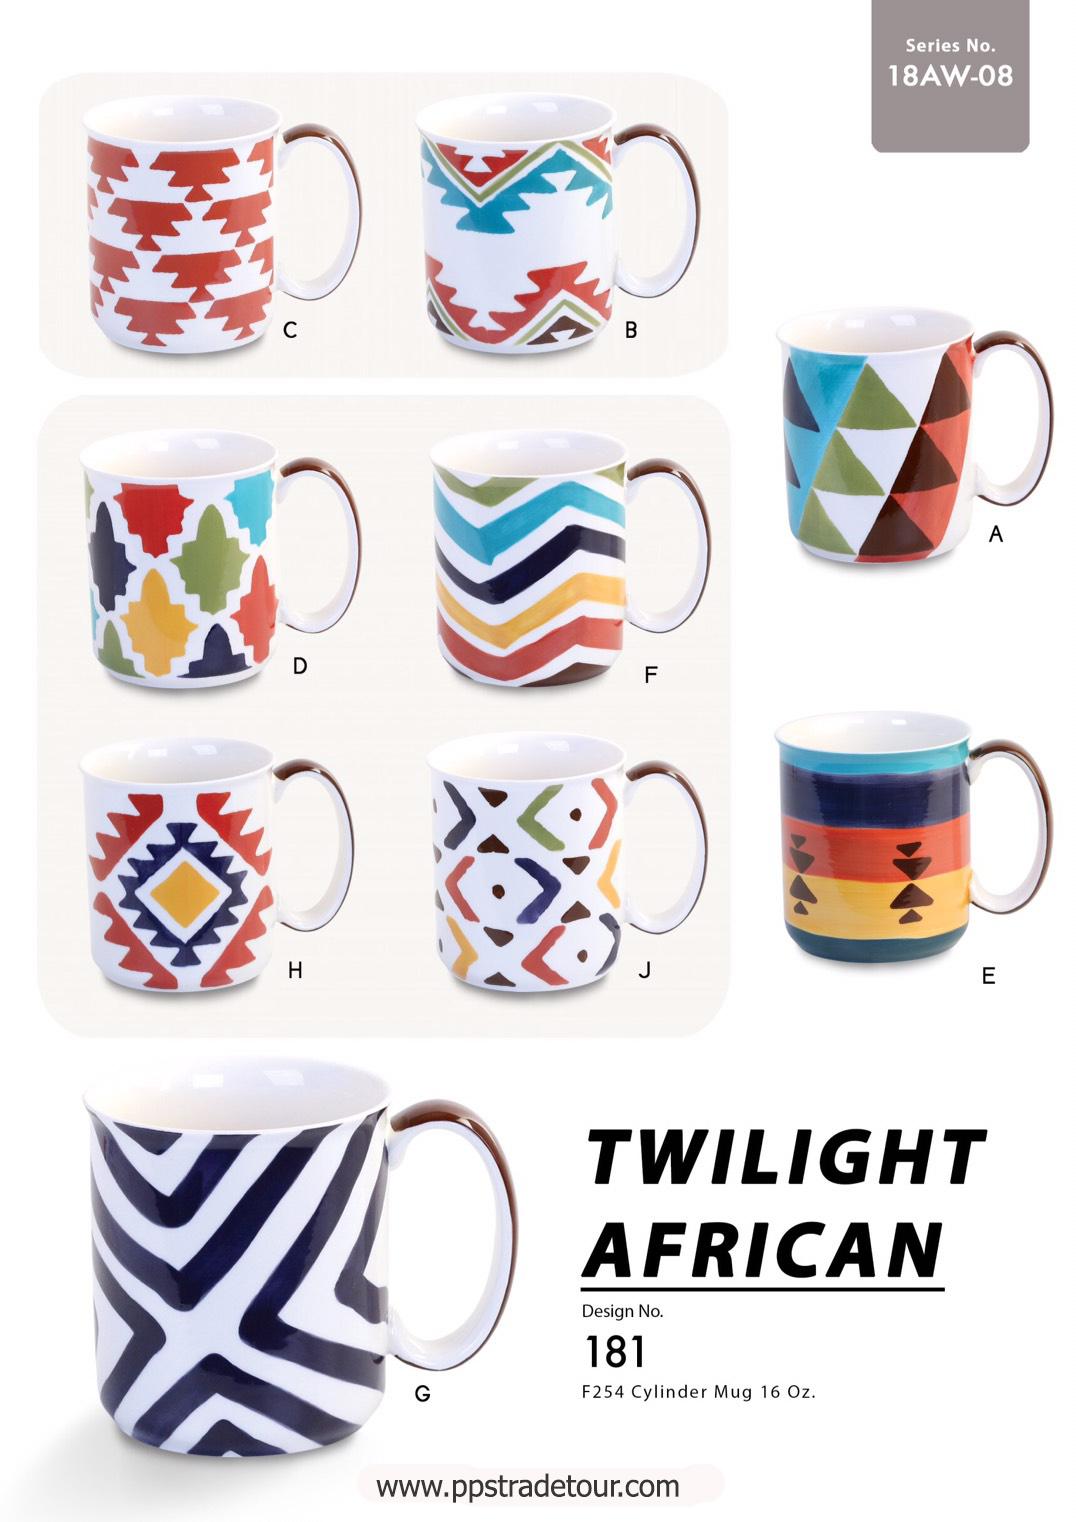 Twilight African-Ceramic Mug 16 Oz.